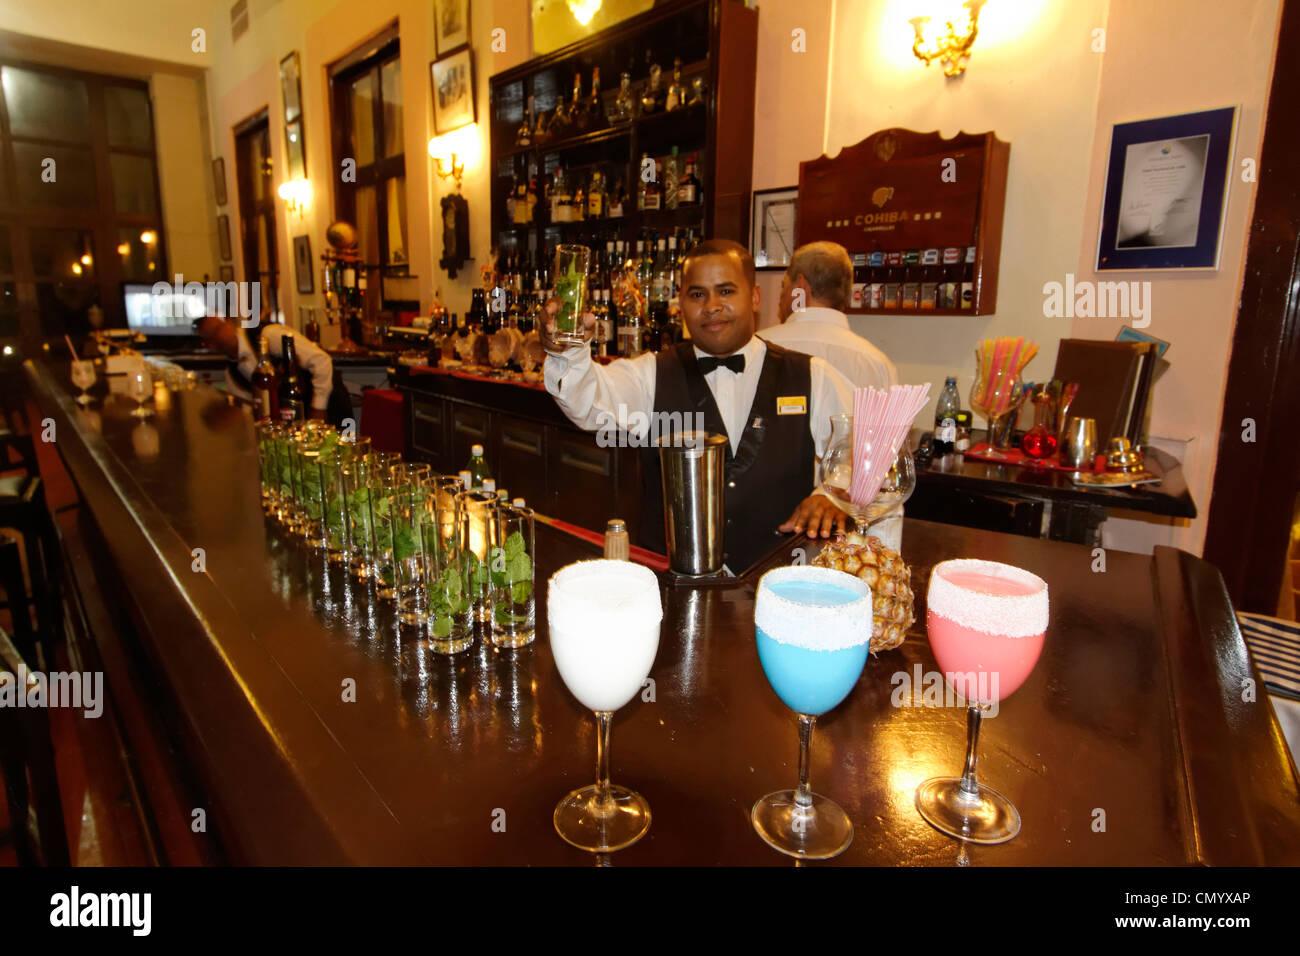 Hotel National Vedado, berühmte Bar, Barkeeper, Frozen Daiquiri, Kuba, große Antillen, Antillen, Karibik, Stockbild